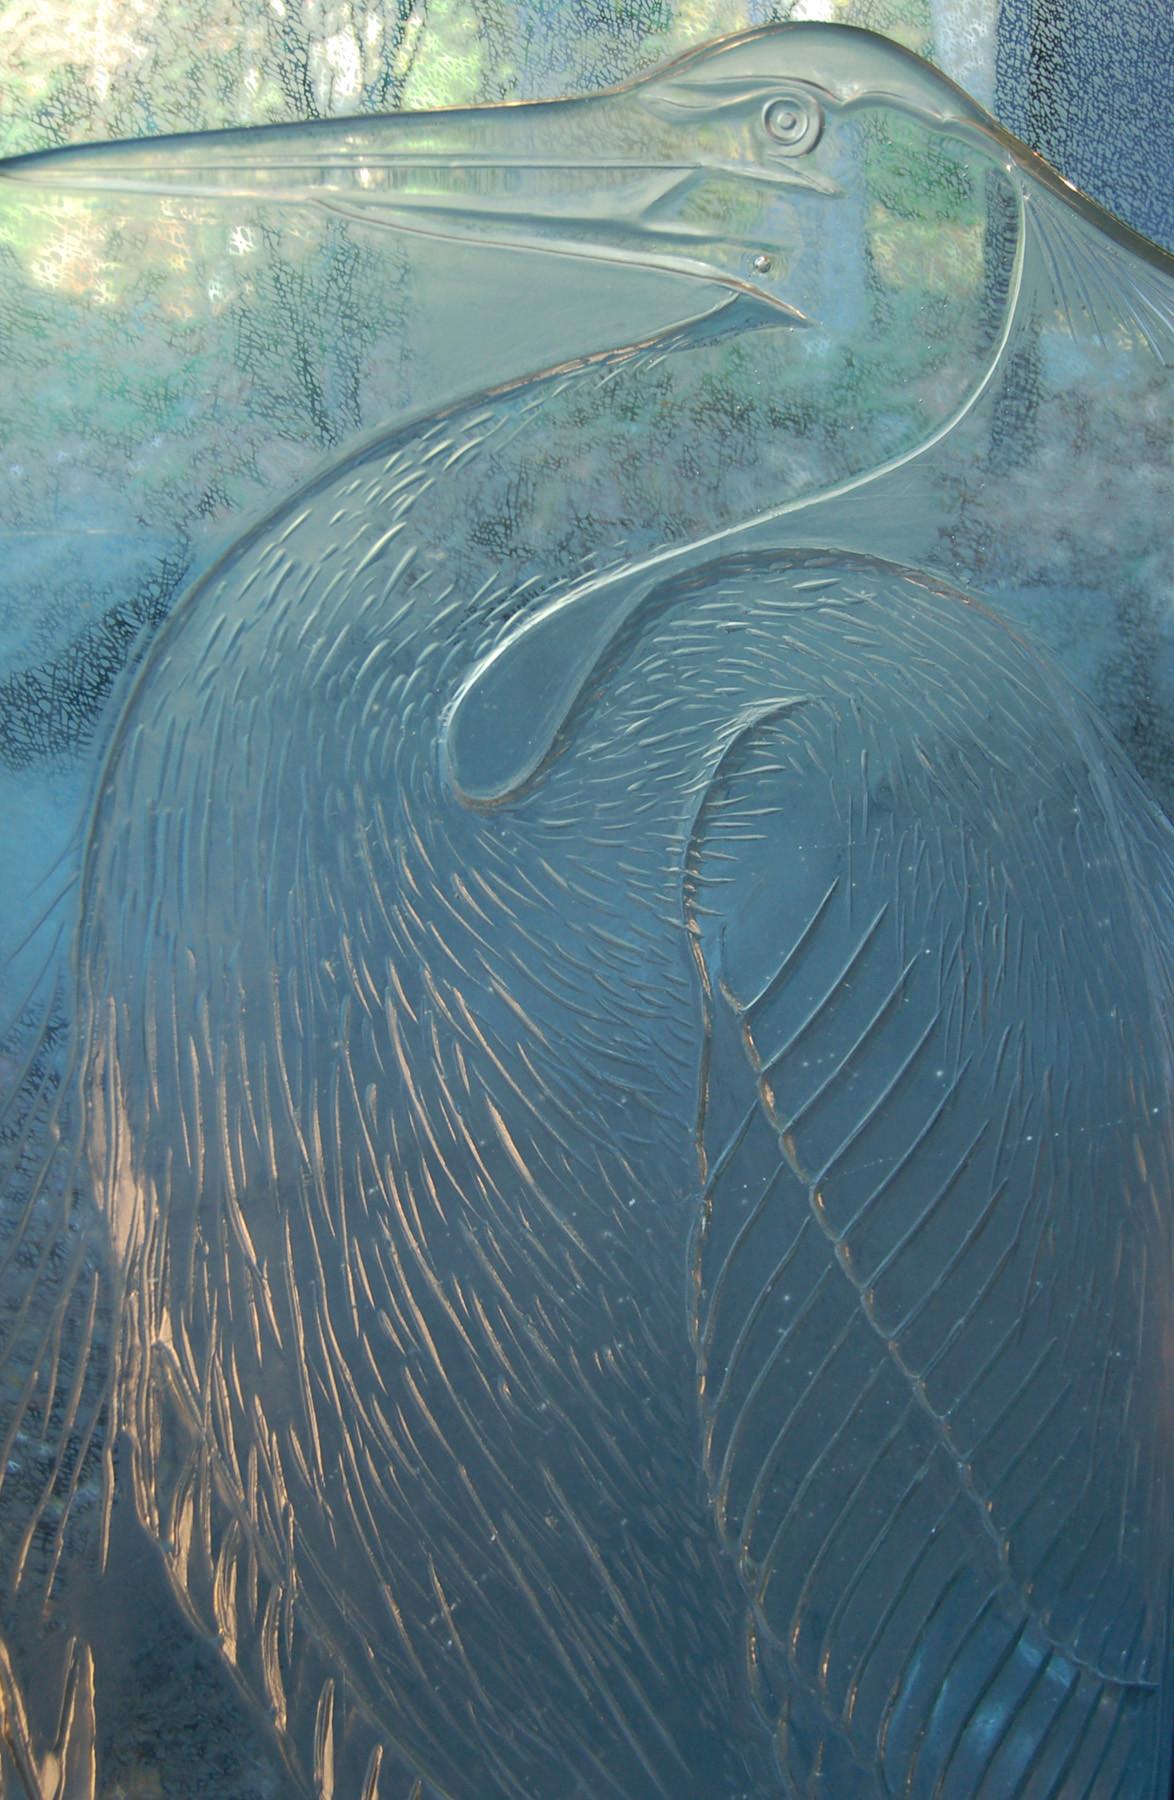 Fused Glass Heron Sculpture